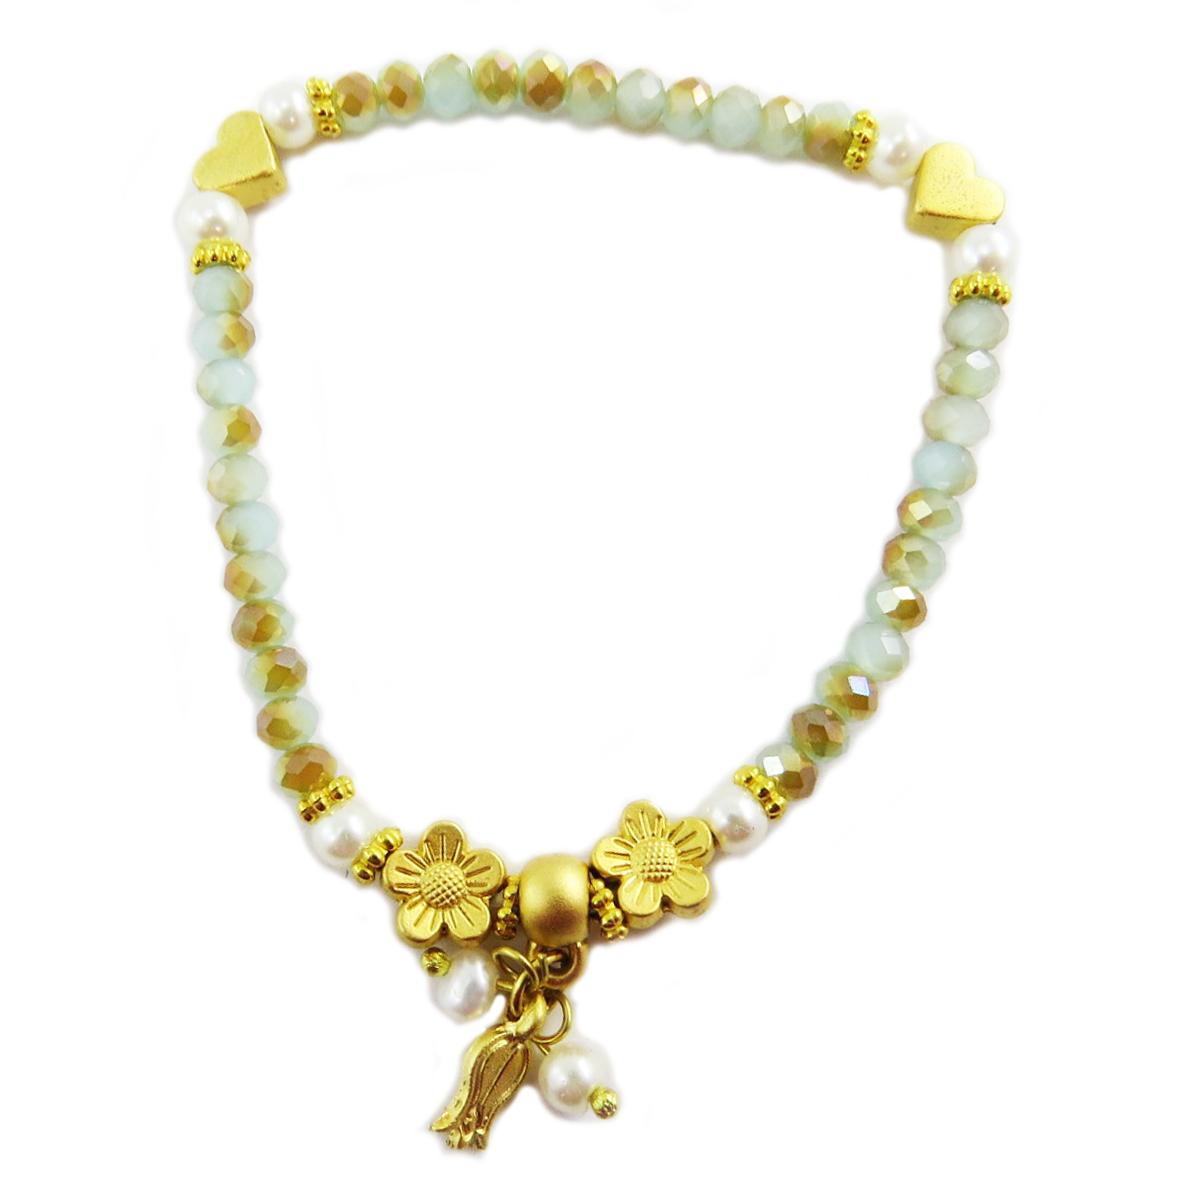 Bracelet artisanal \'Cléopatra\' vert doré - motif 10 mm - [Q5618]